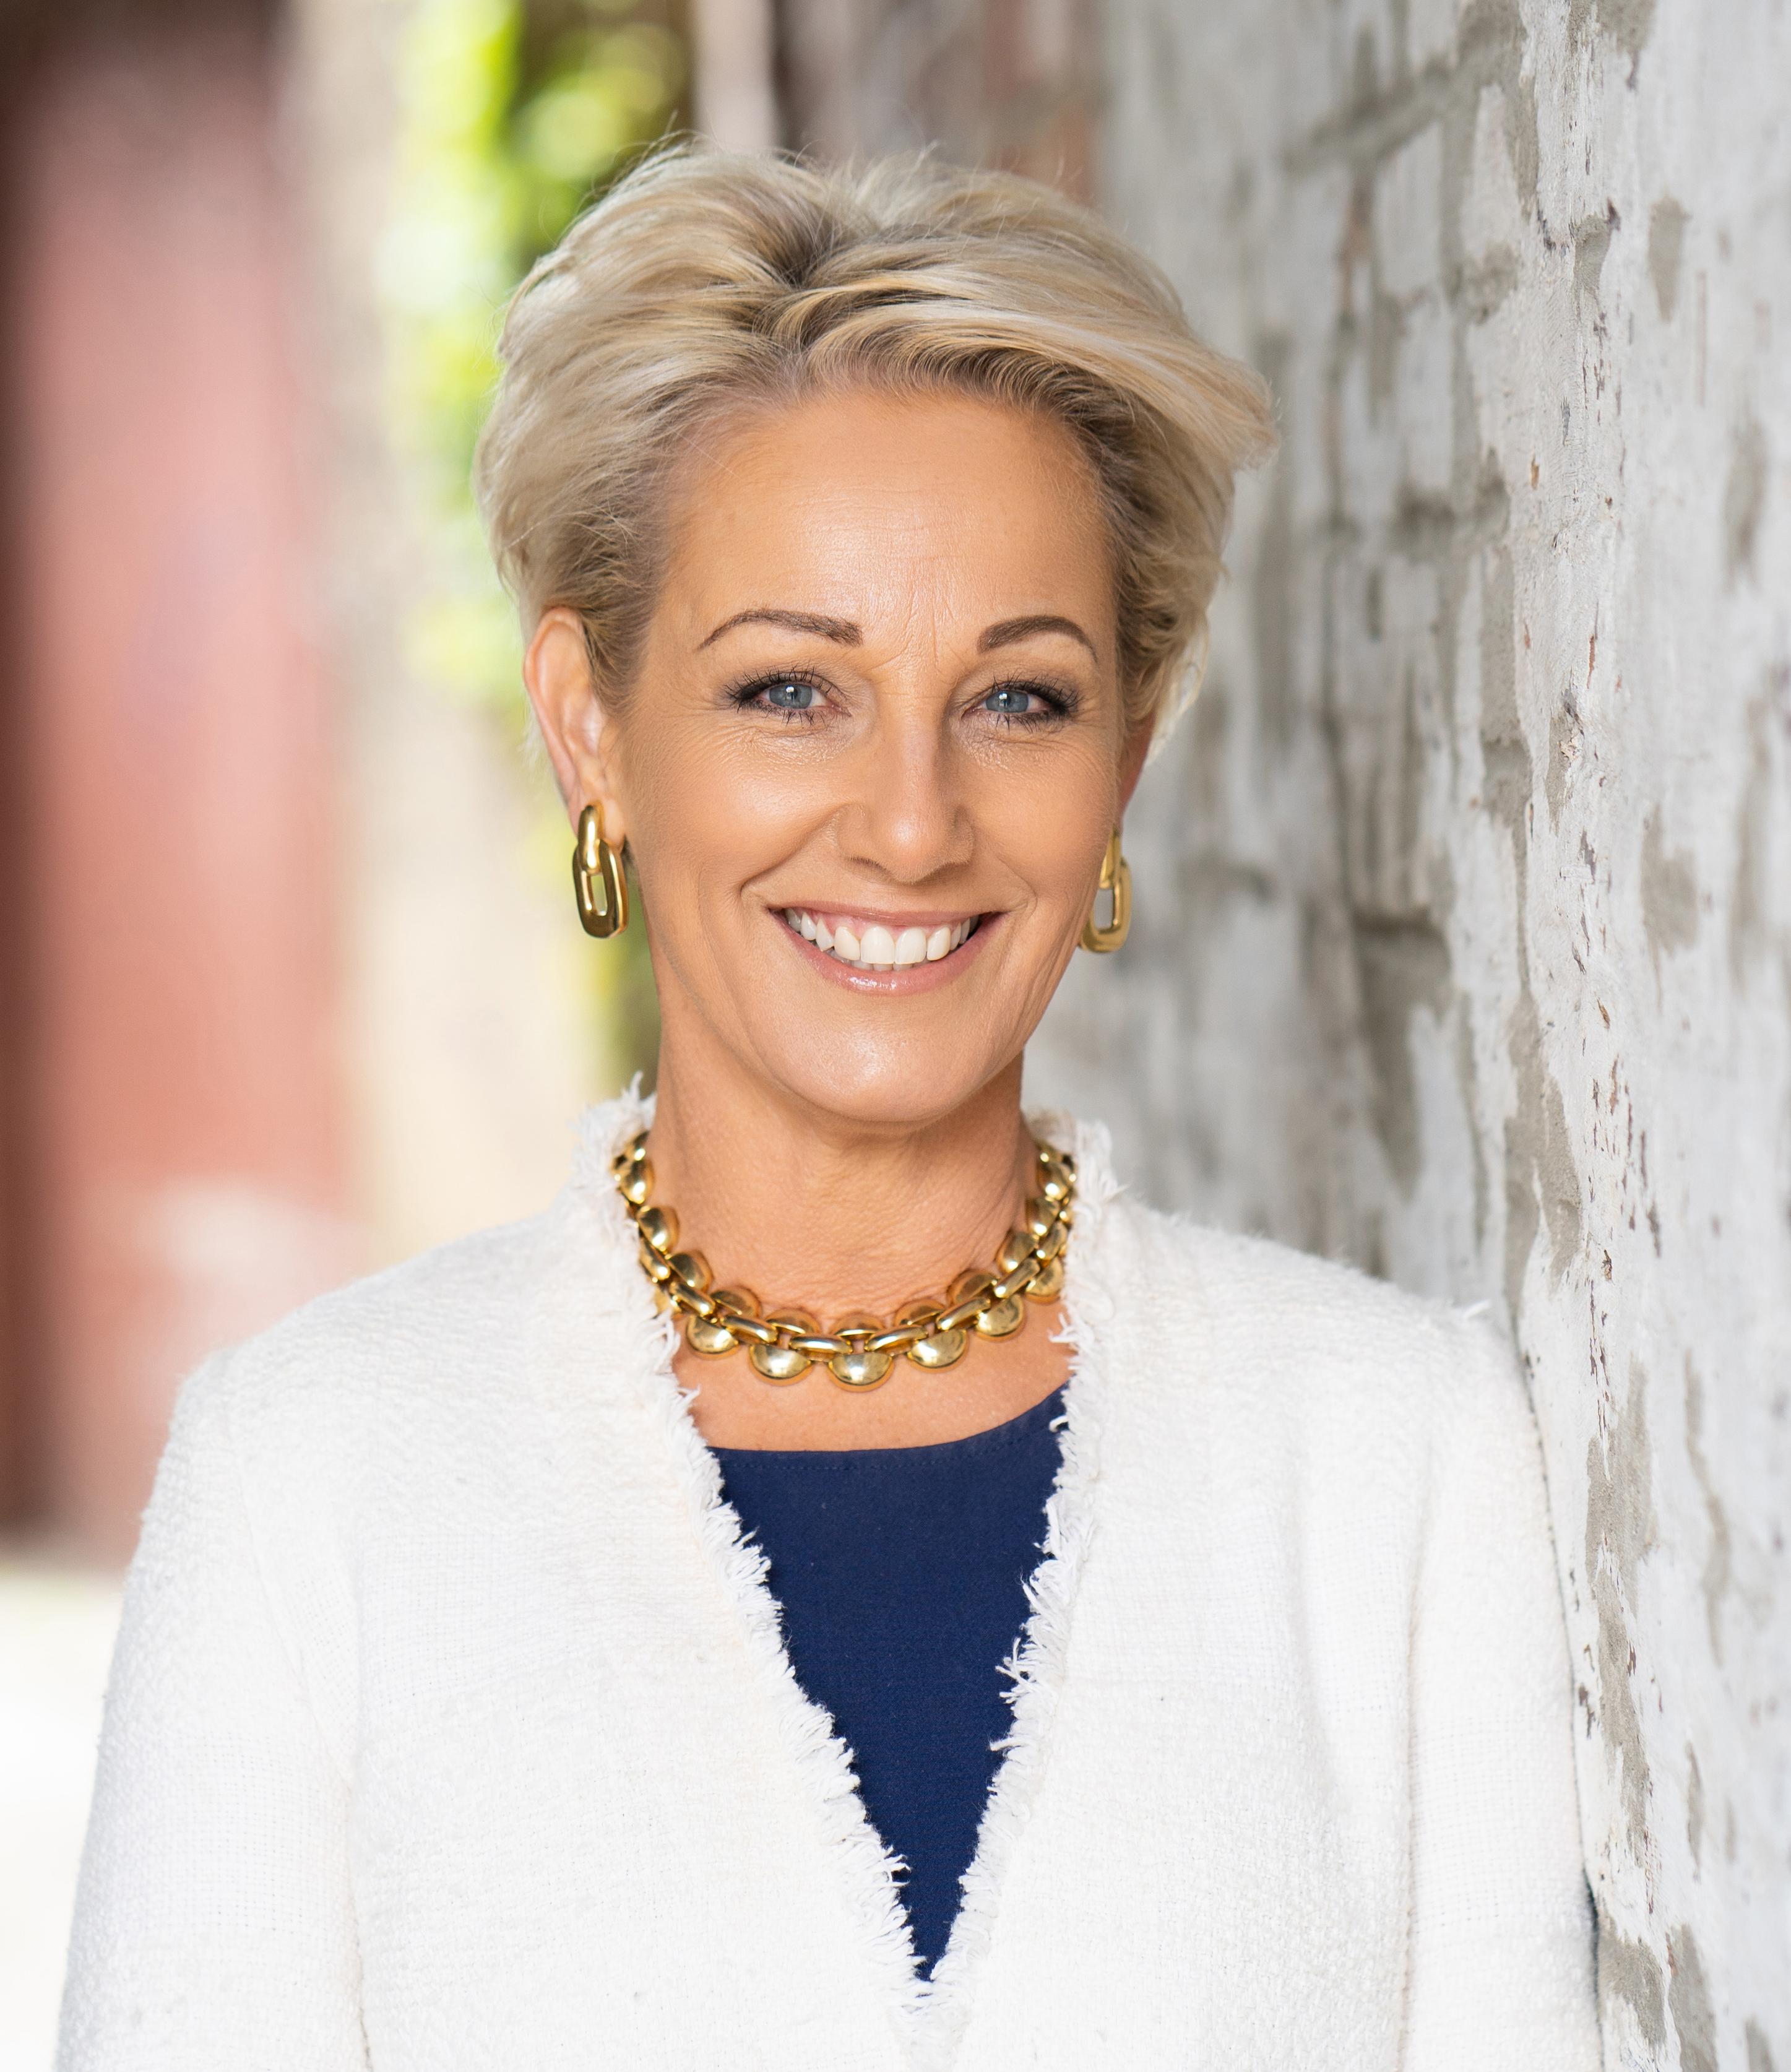 Christine Woodrow